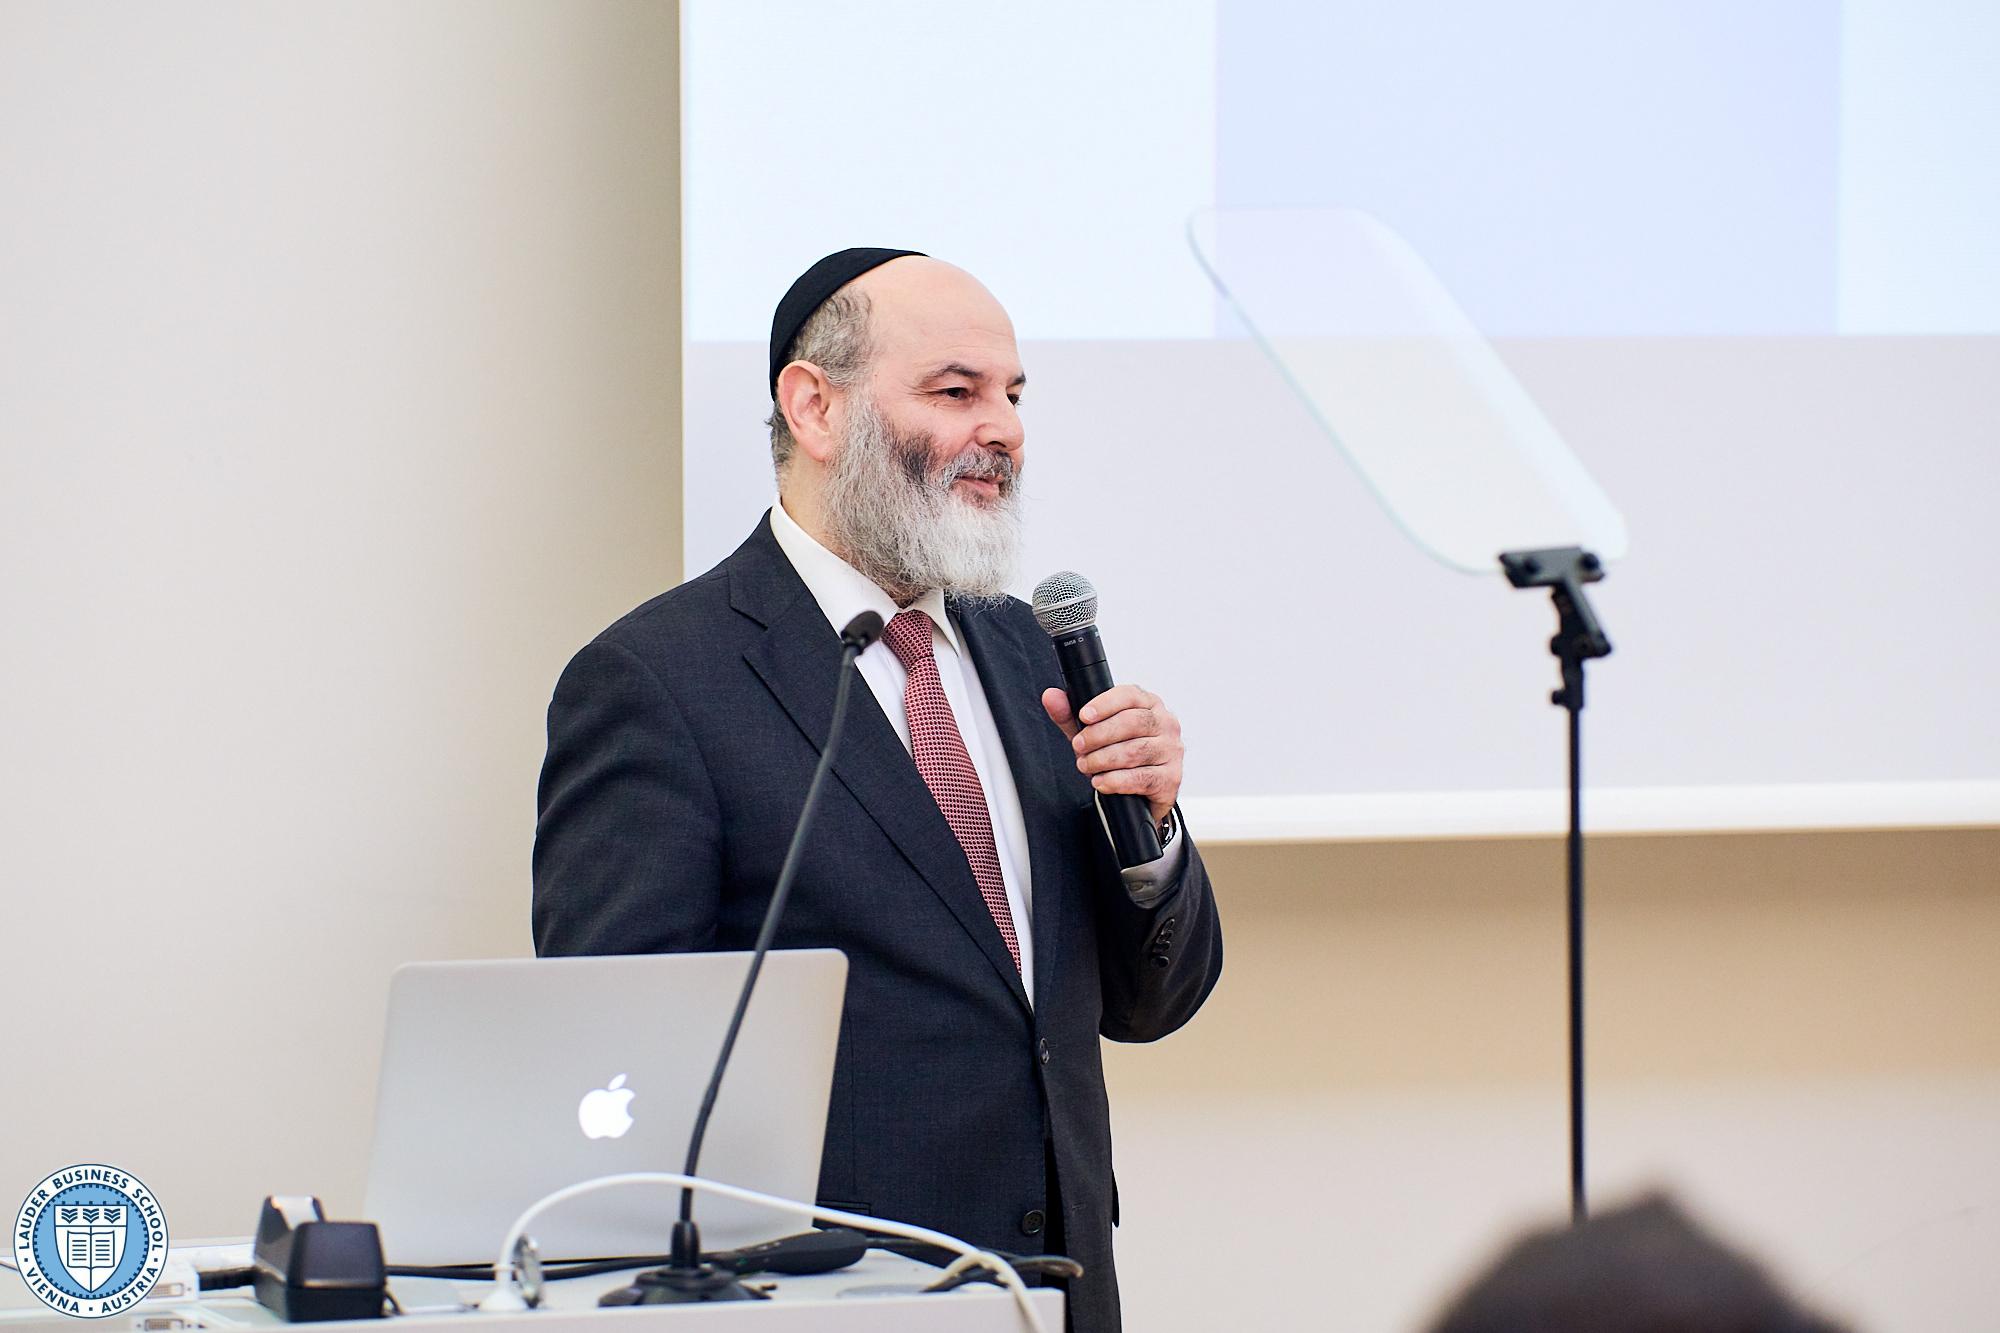 Vice President Prof. Jacob I. Biderman